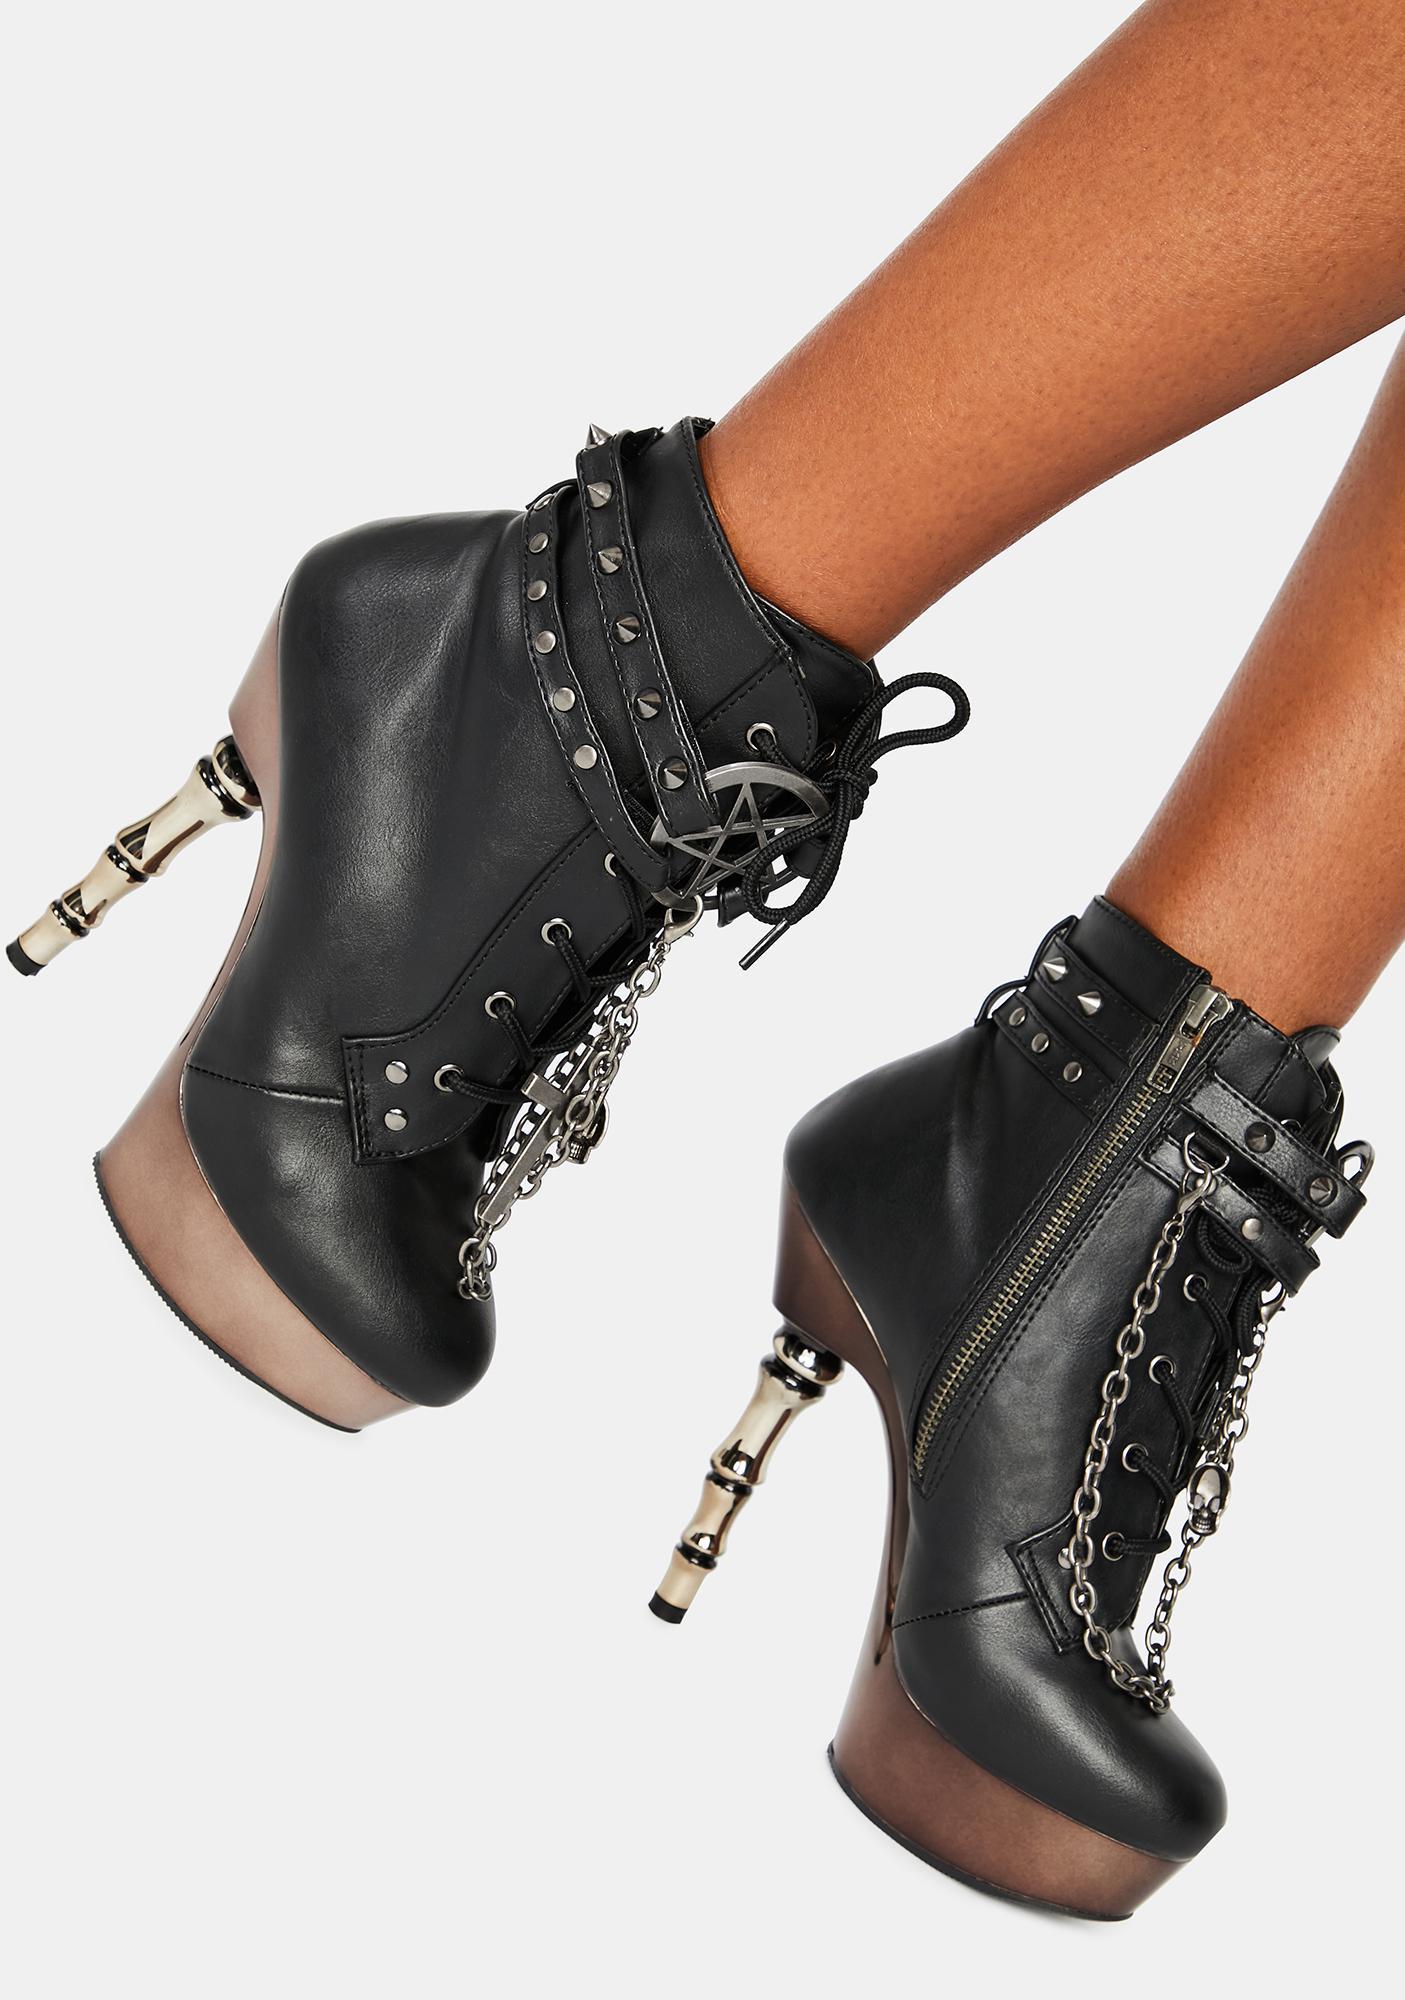 Gothic,Goth Demonia Muerto-1030 Black Vegan Leather Platform Heel Boots